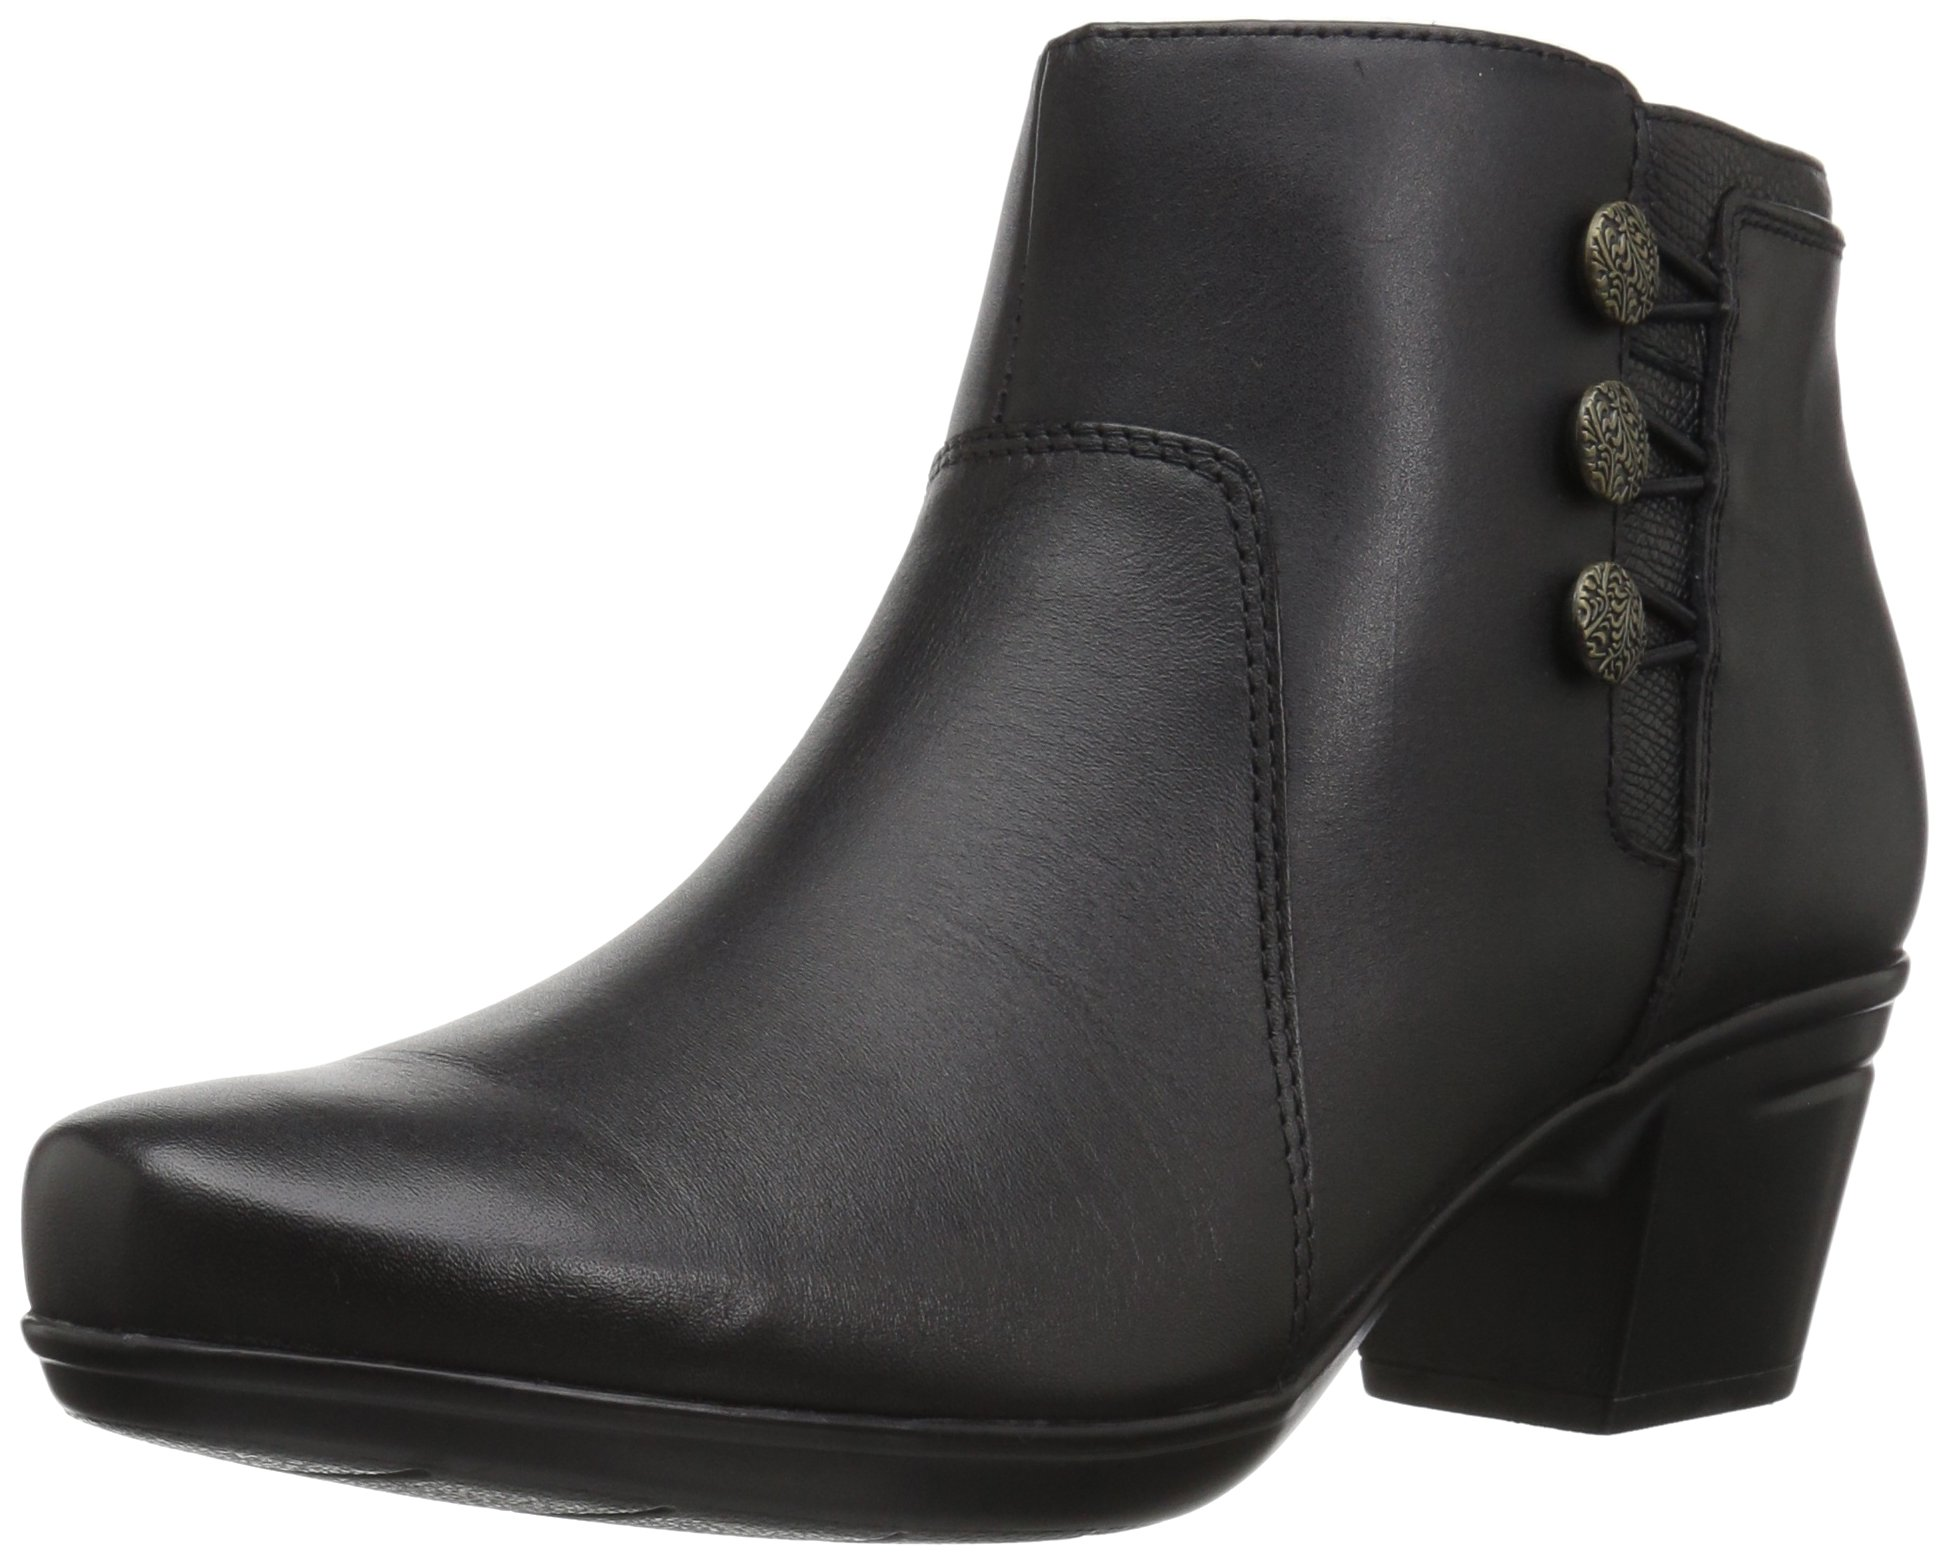 CLARKS Womens Emslie Bootie Leather